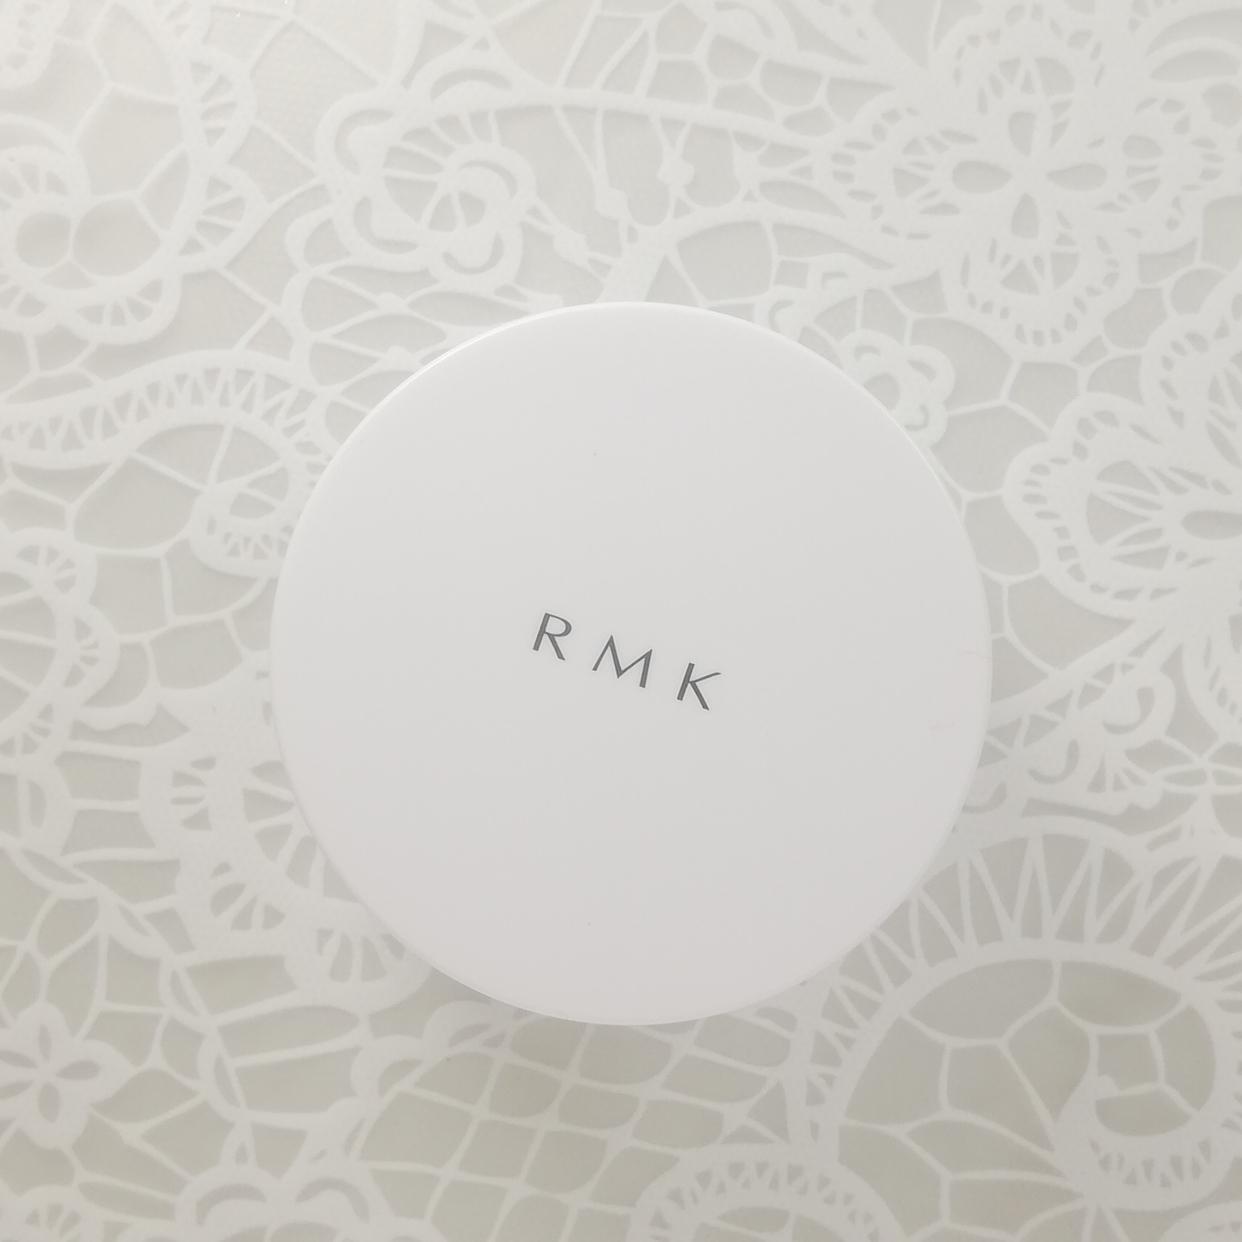 RMK(アールエムケー) クレンジングバーム リフレッシュの良い点・メリットに関するりか✨さんの口コミ画像1